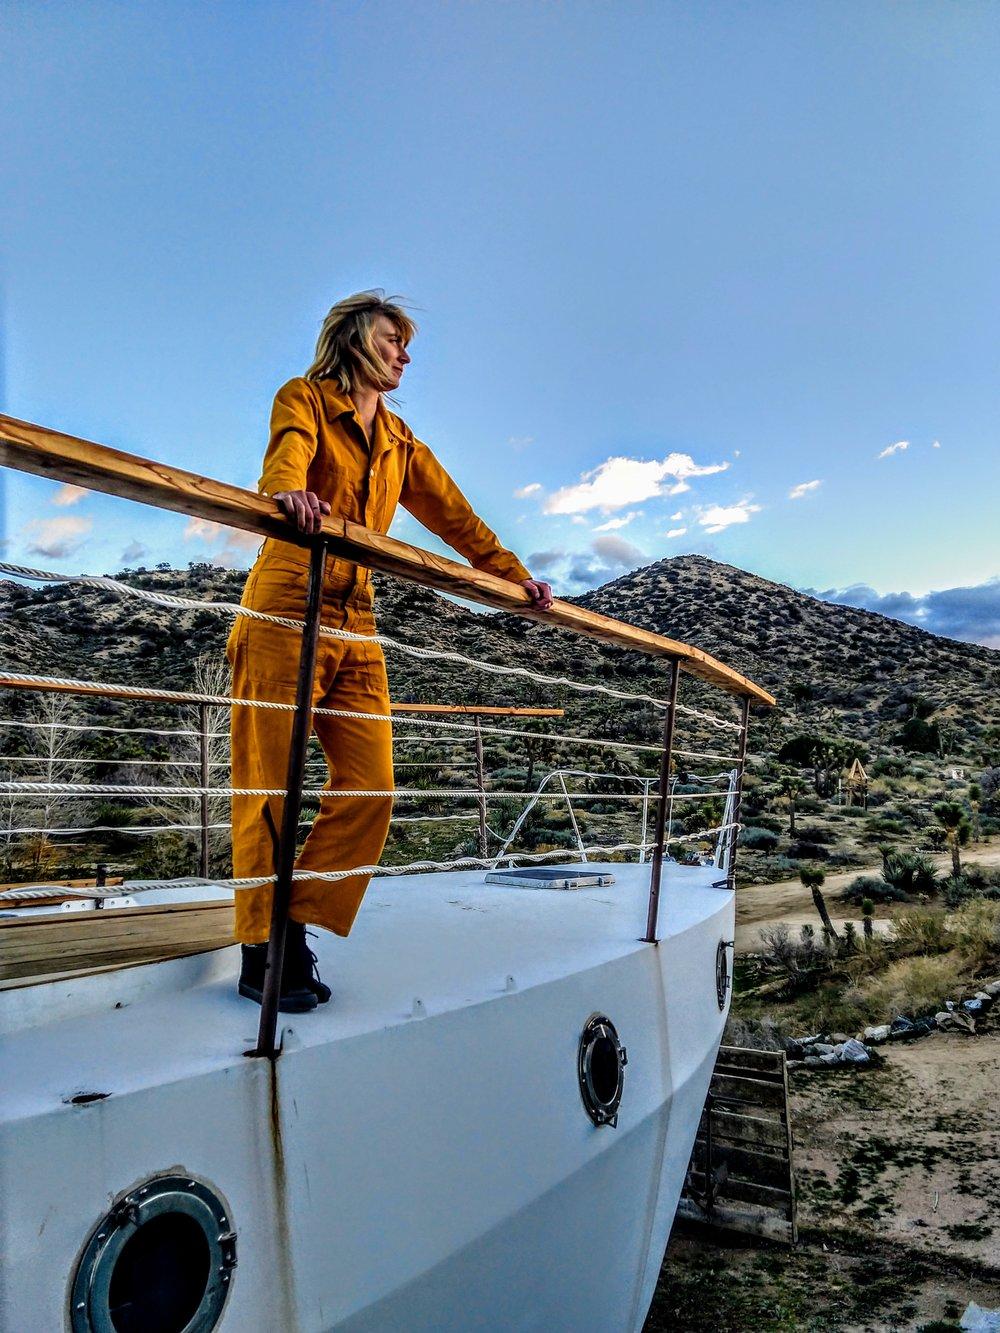 Laura Austin - Photographer, adventurer, desert sailor, and my jumpsuit hero!